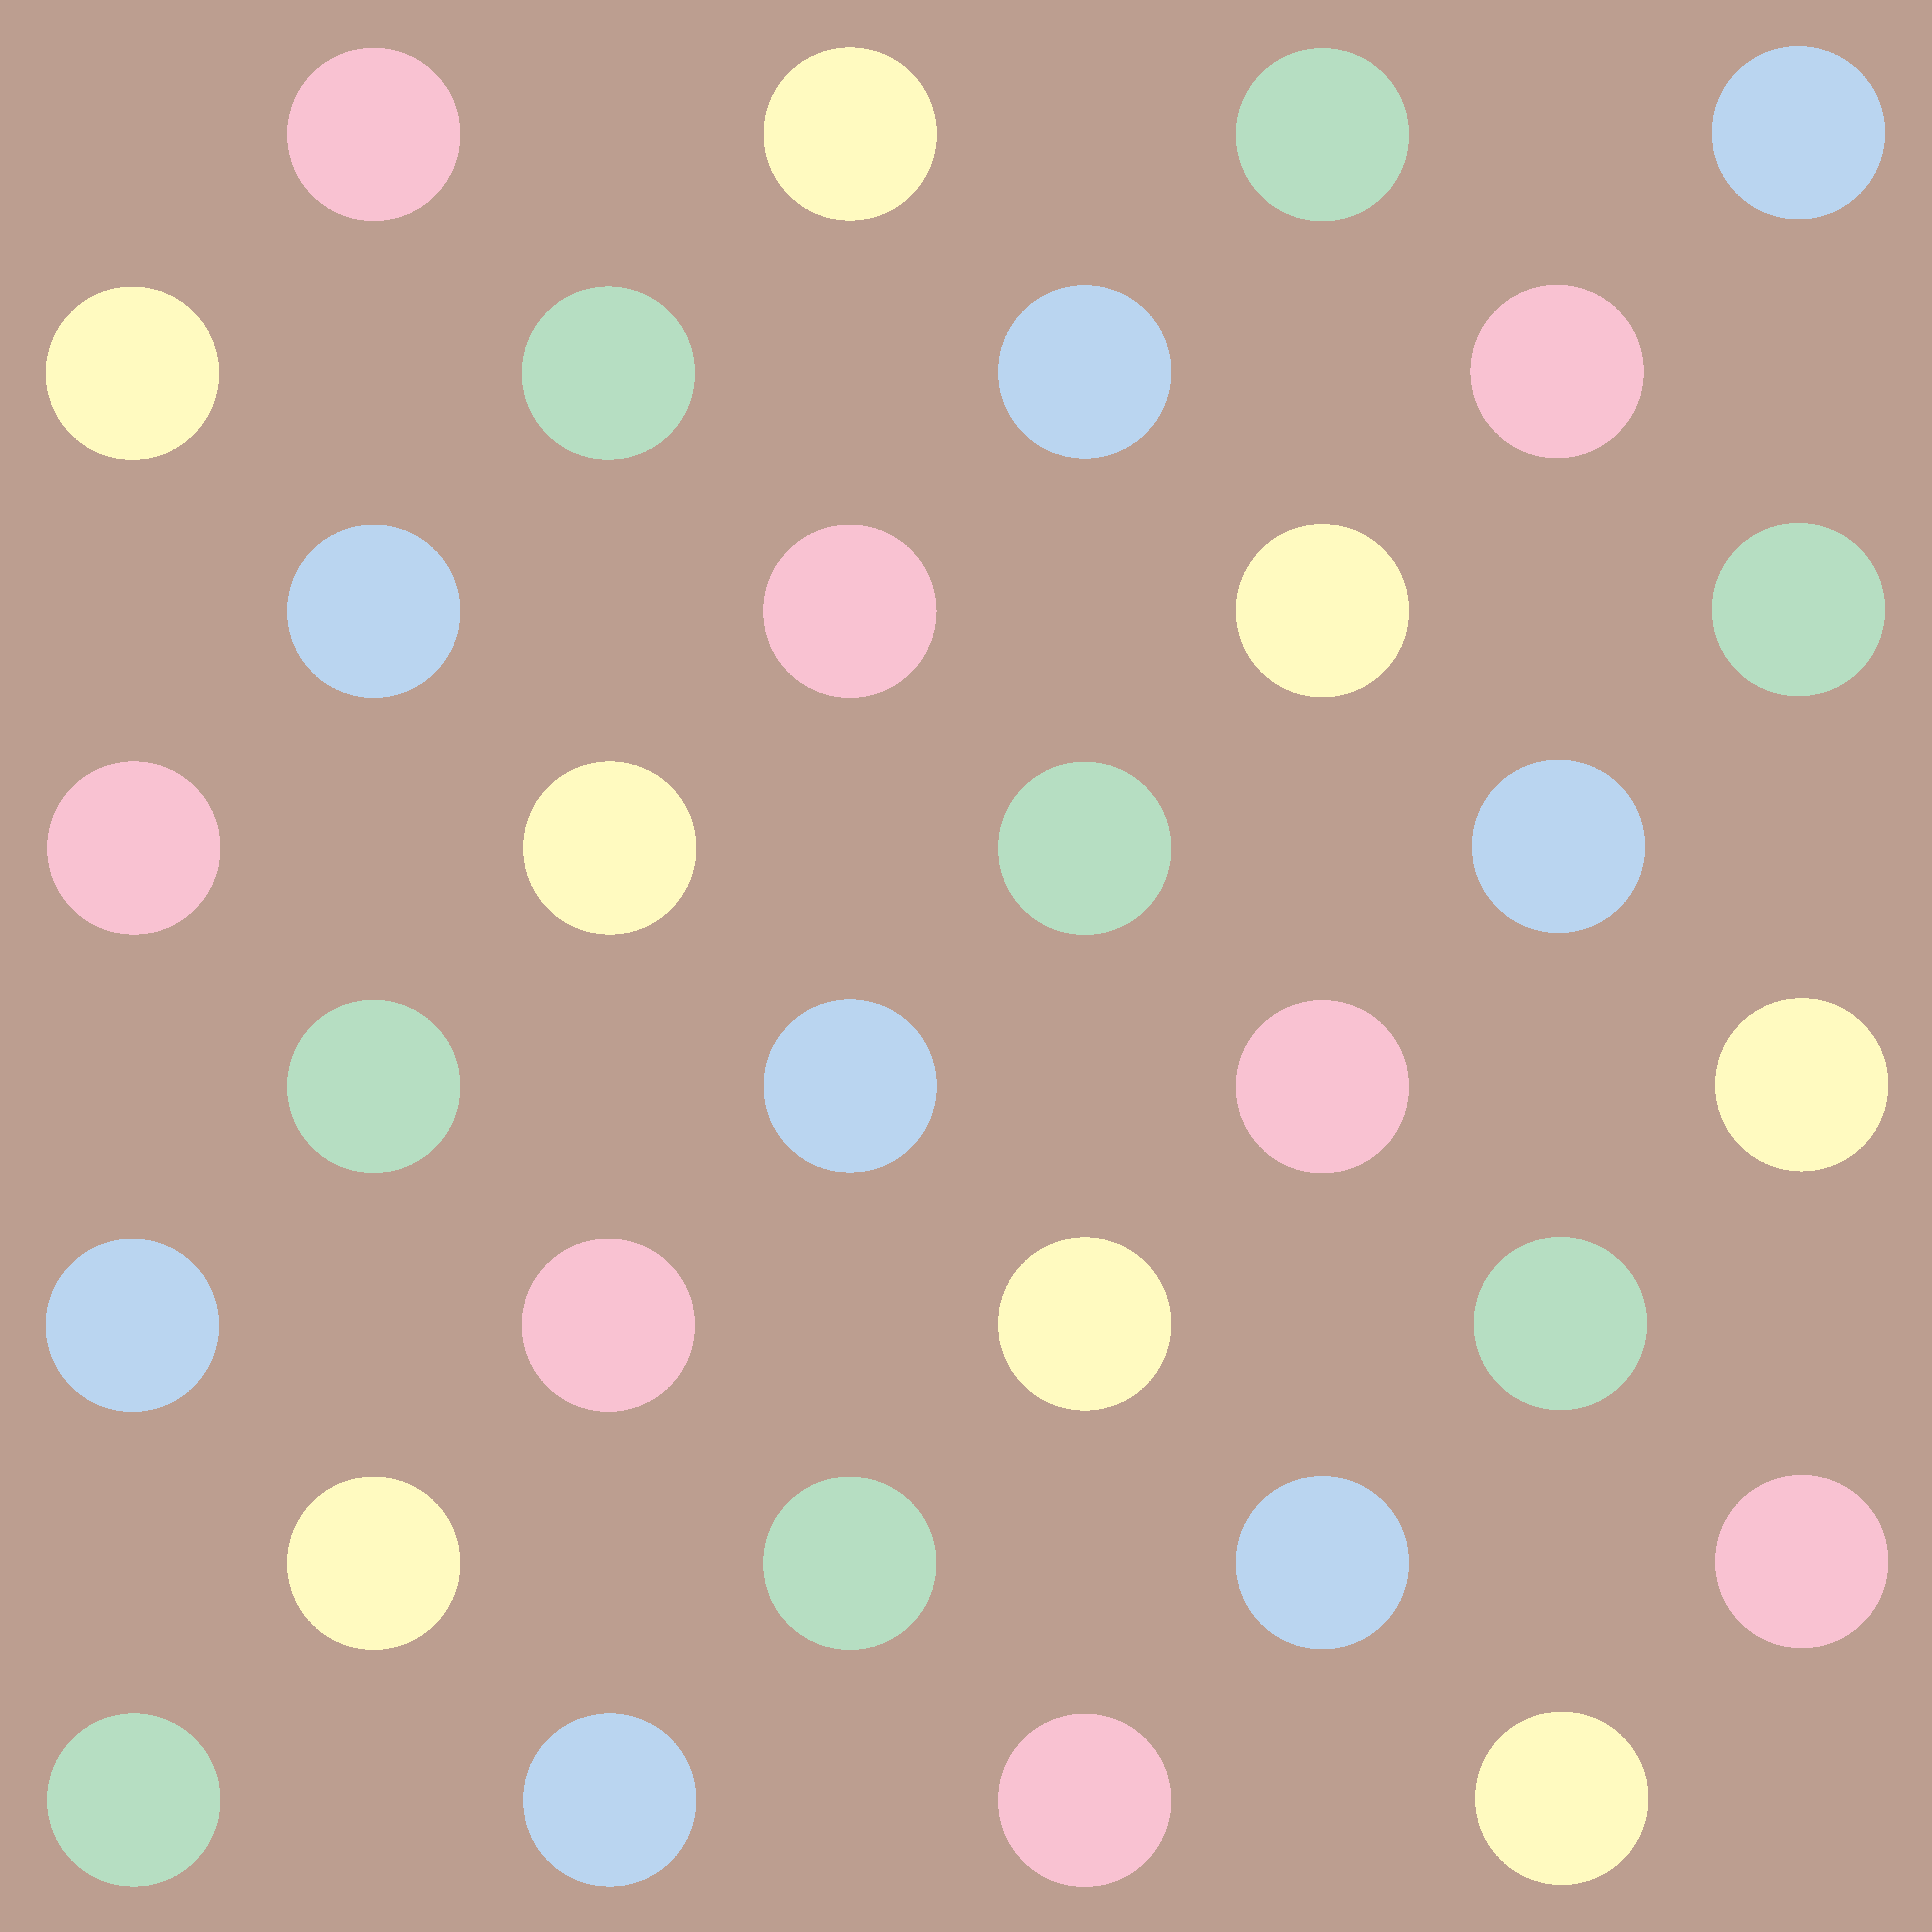 Cute Dot Wallpapers Top Free Cute Dot Backgrounds